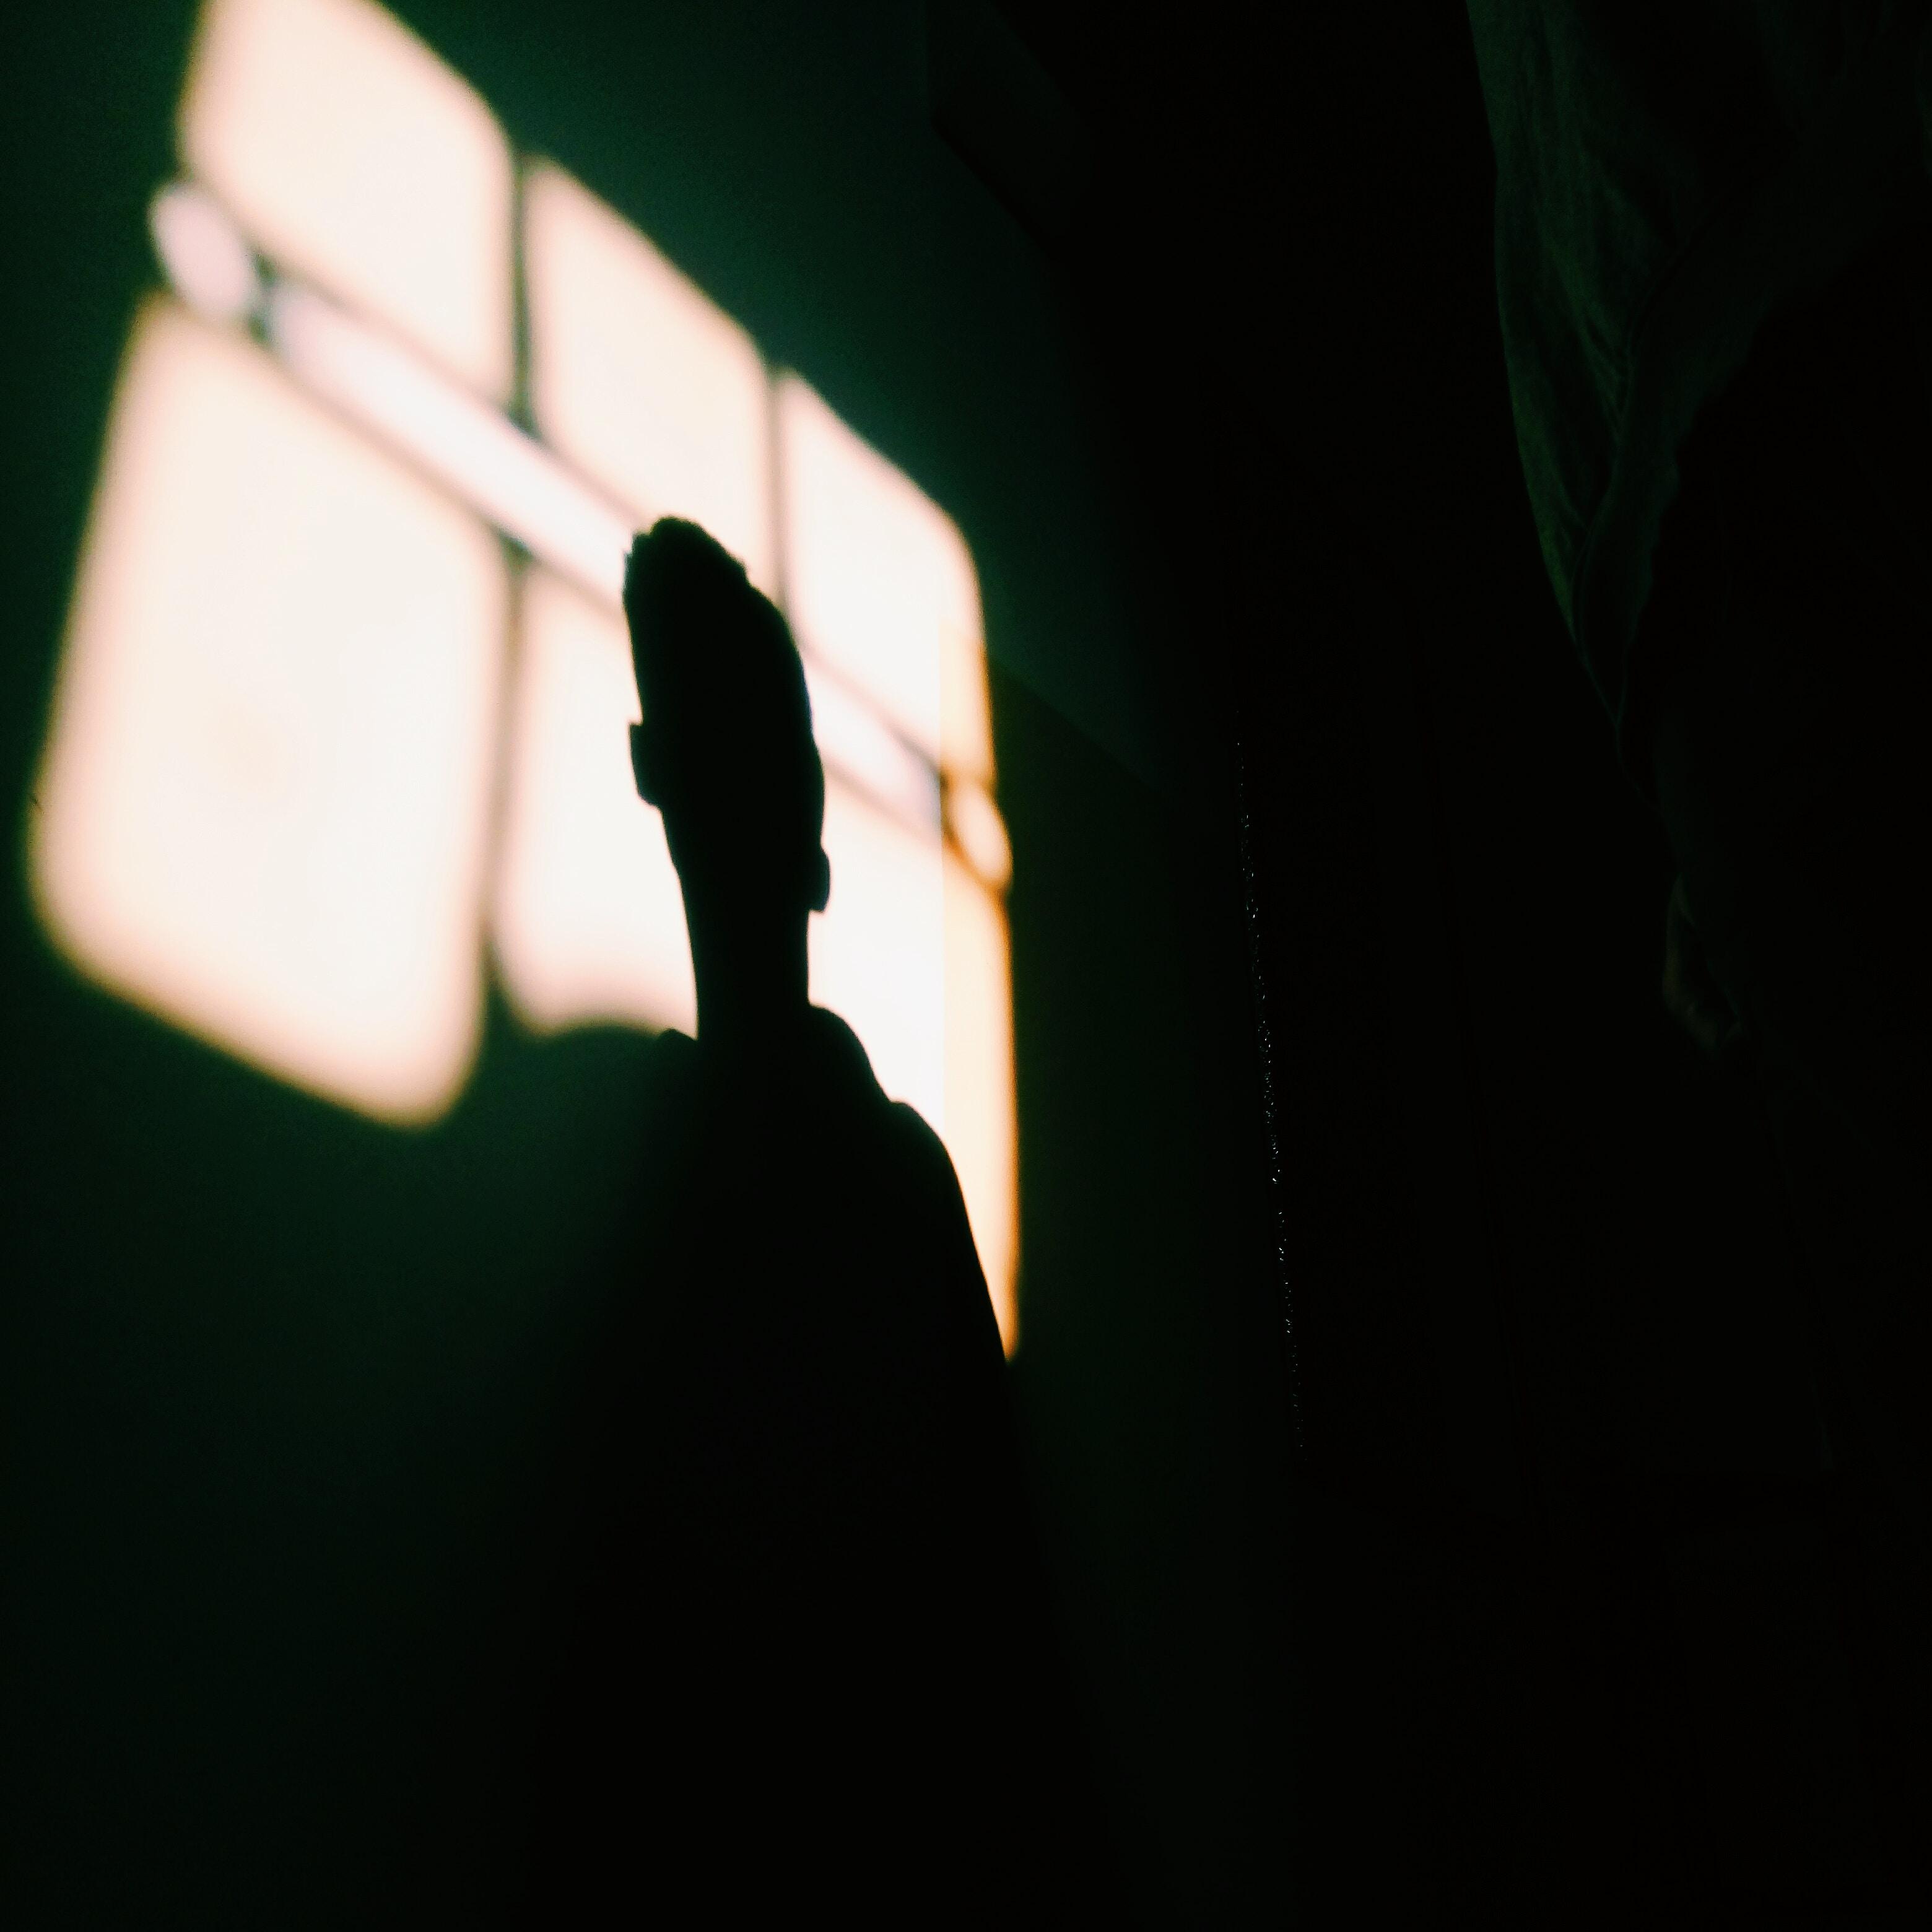 ME photo by Adam Bendjaima (@benadam) on Unsplash